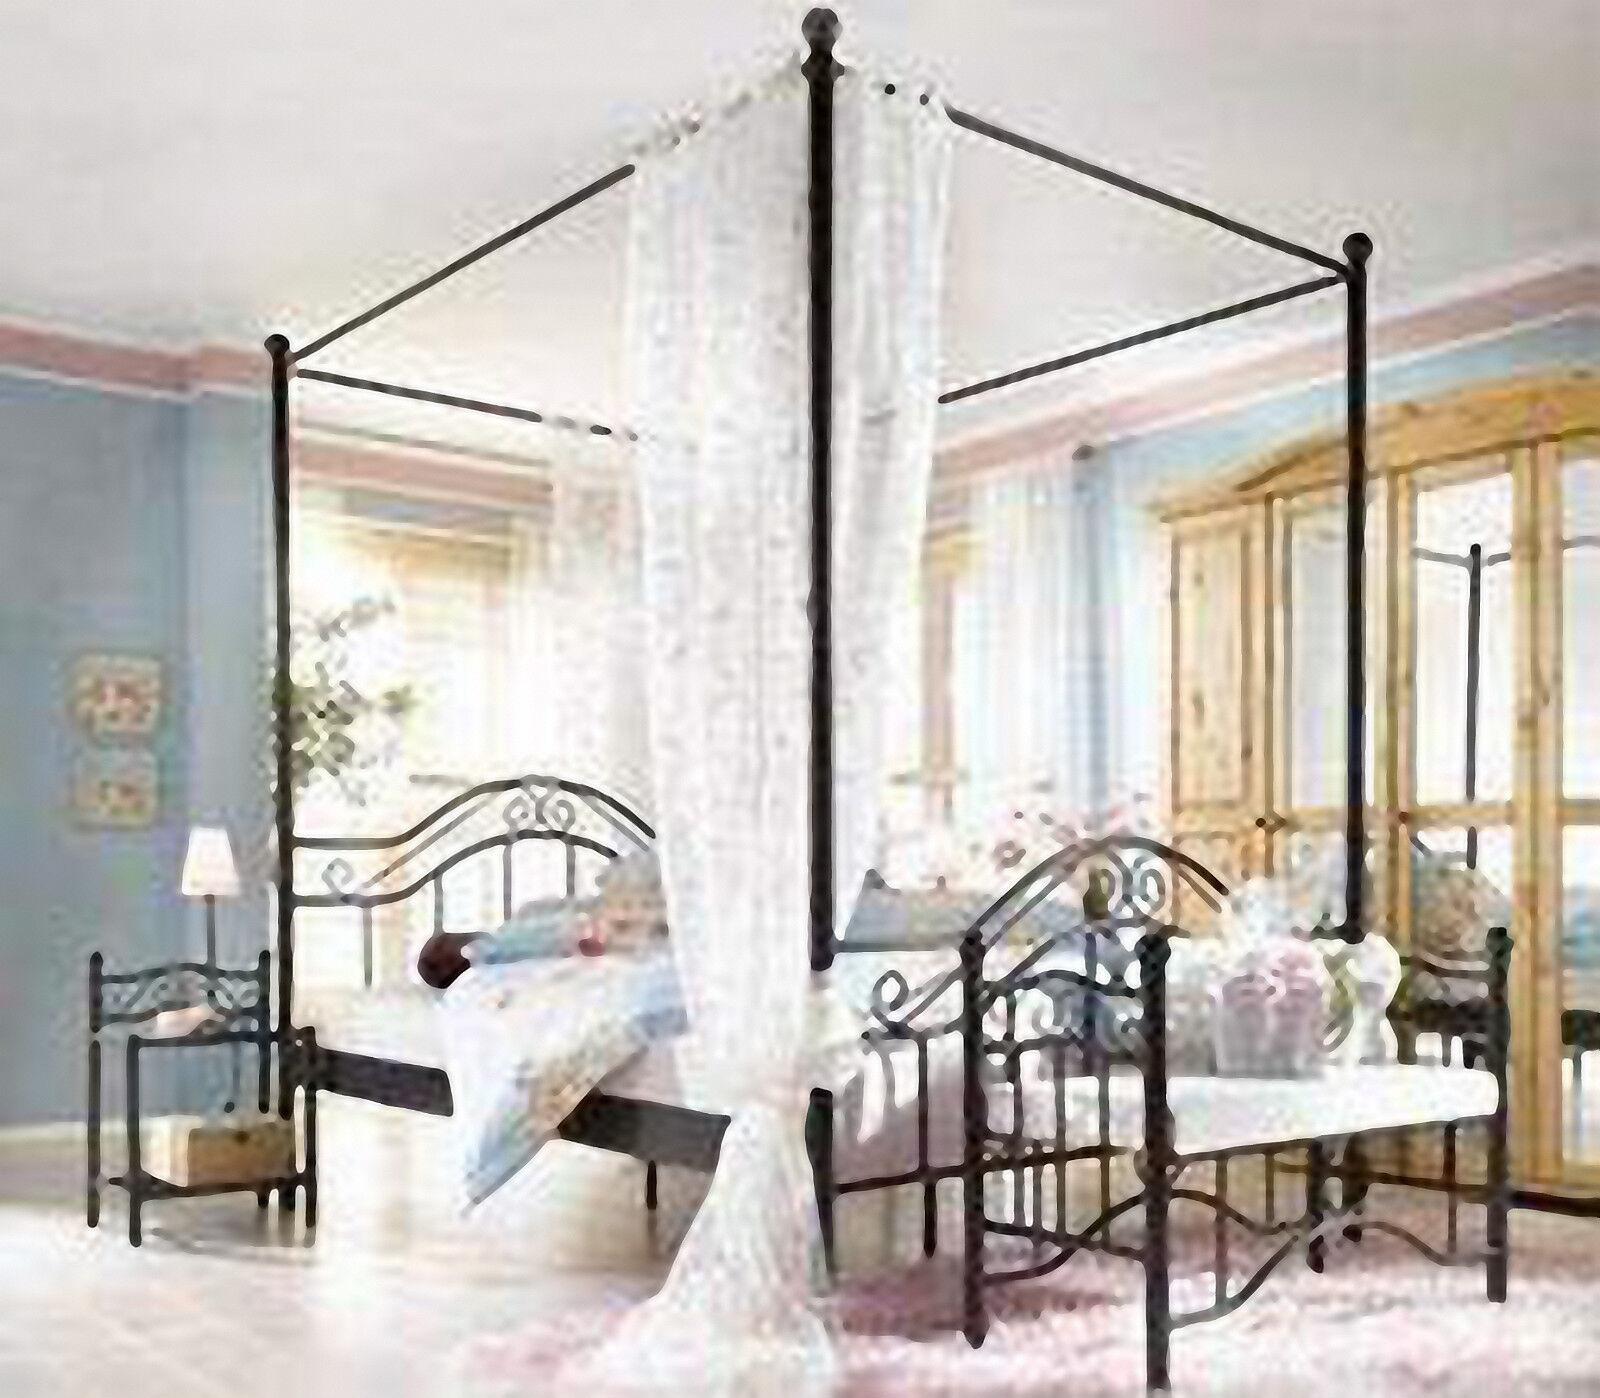 Himmelbett weiß romantisch  Himmelbett weiß 90 x 200 cm Manege Himmel Bett Metallbett romantisch ...